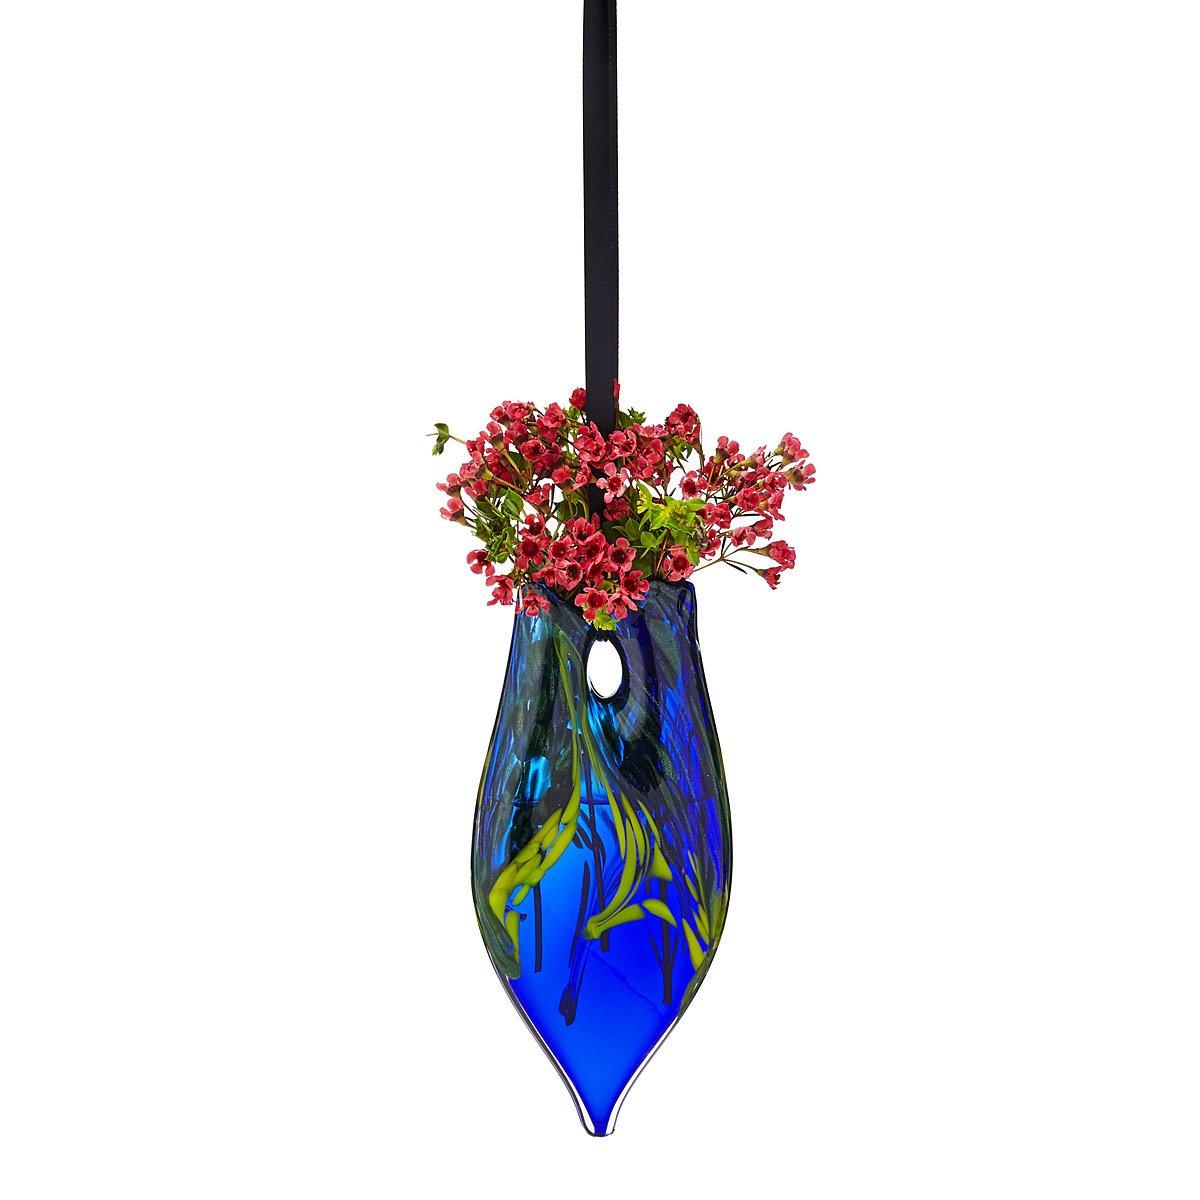 Hanging Heart Vase Glass Vessel Uncommongoods